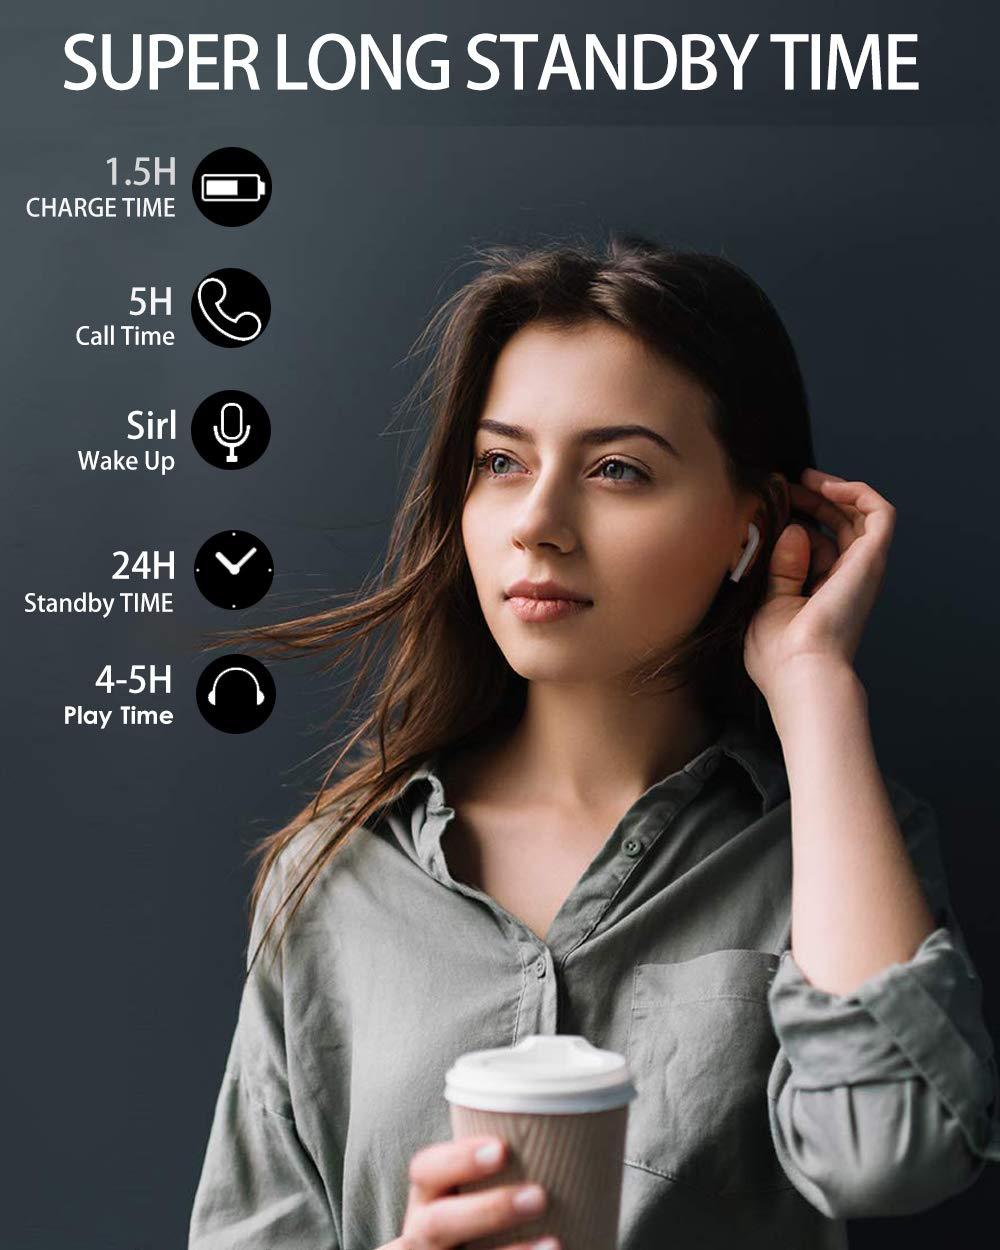 Kabellose Kopfh/örer in Ear Bluetooth 5.0 Sport Kabellose Stereo-Minikopfh/örer mit IPX5 Wasserdicht,Mikrofon Wei/ß-i9X f/ür Smartphone